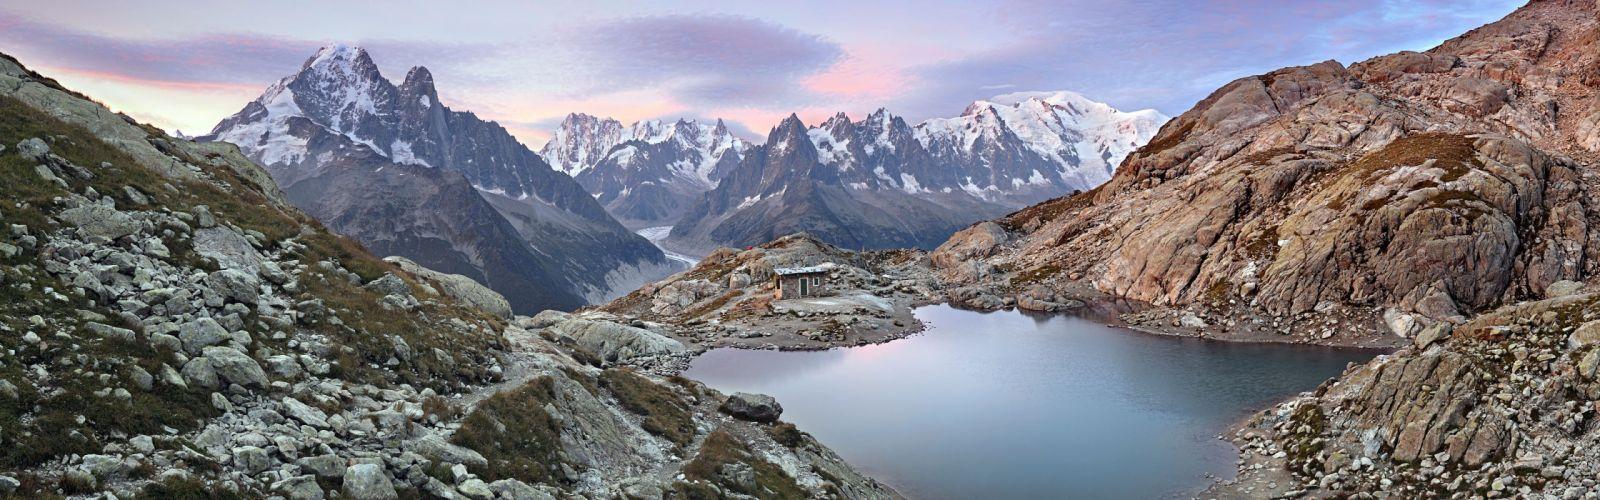 sunrise mountains snow rocks Europe panorama lakes Alps Mont Blanc wallpaper